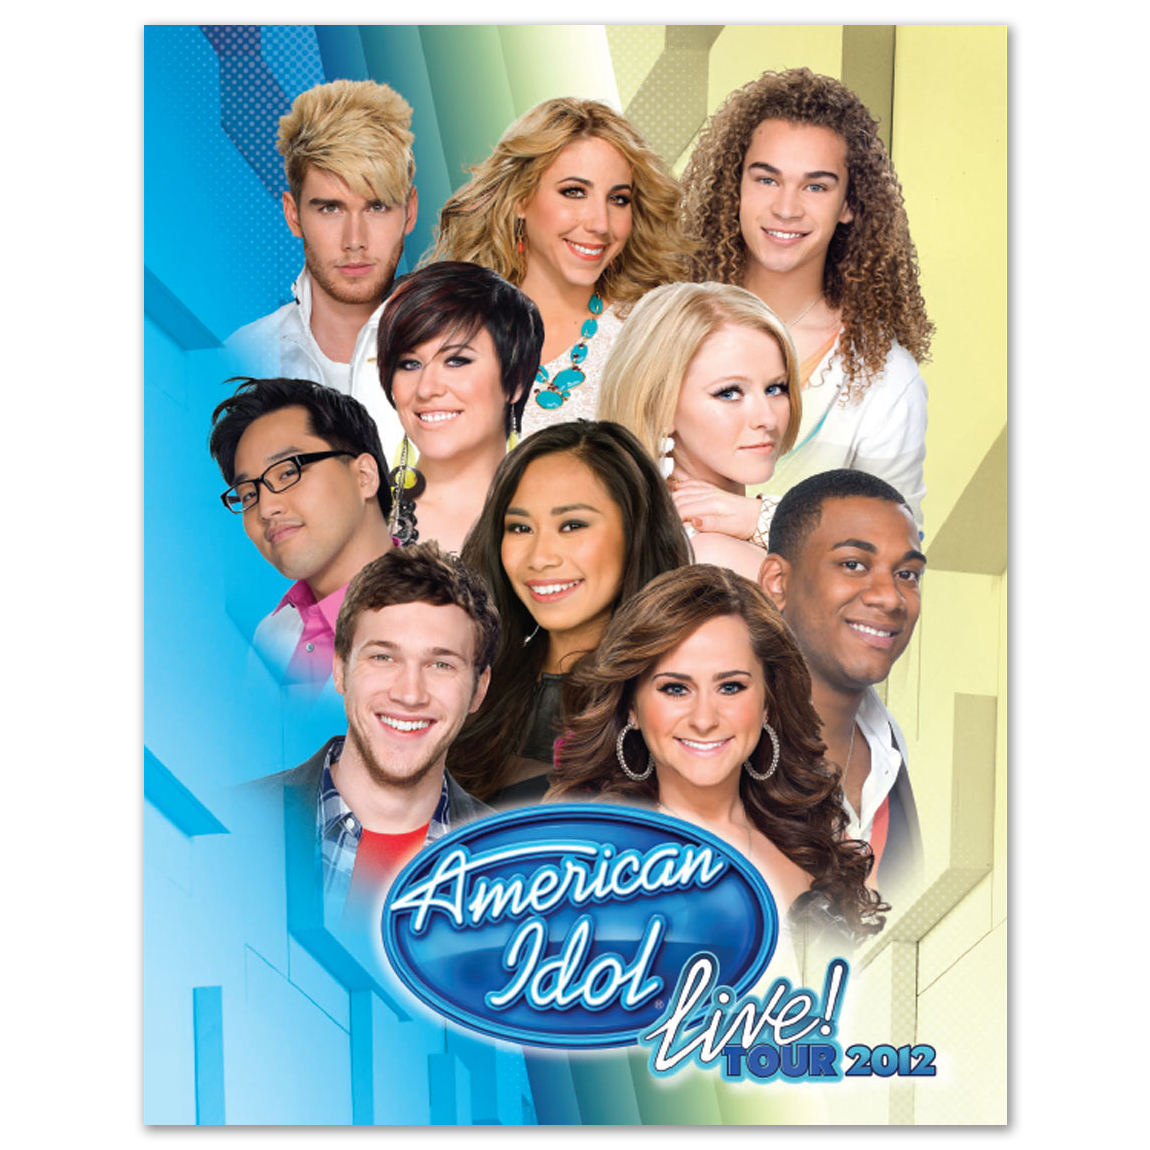 American Idol Live 2012 Tour Program